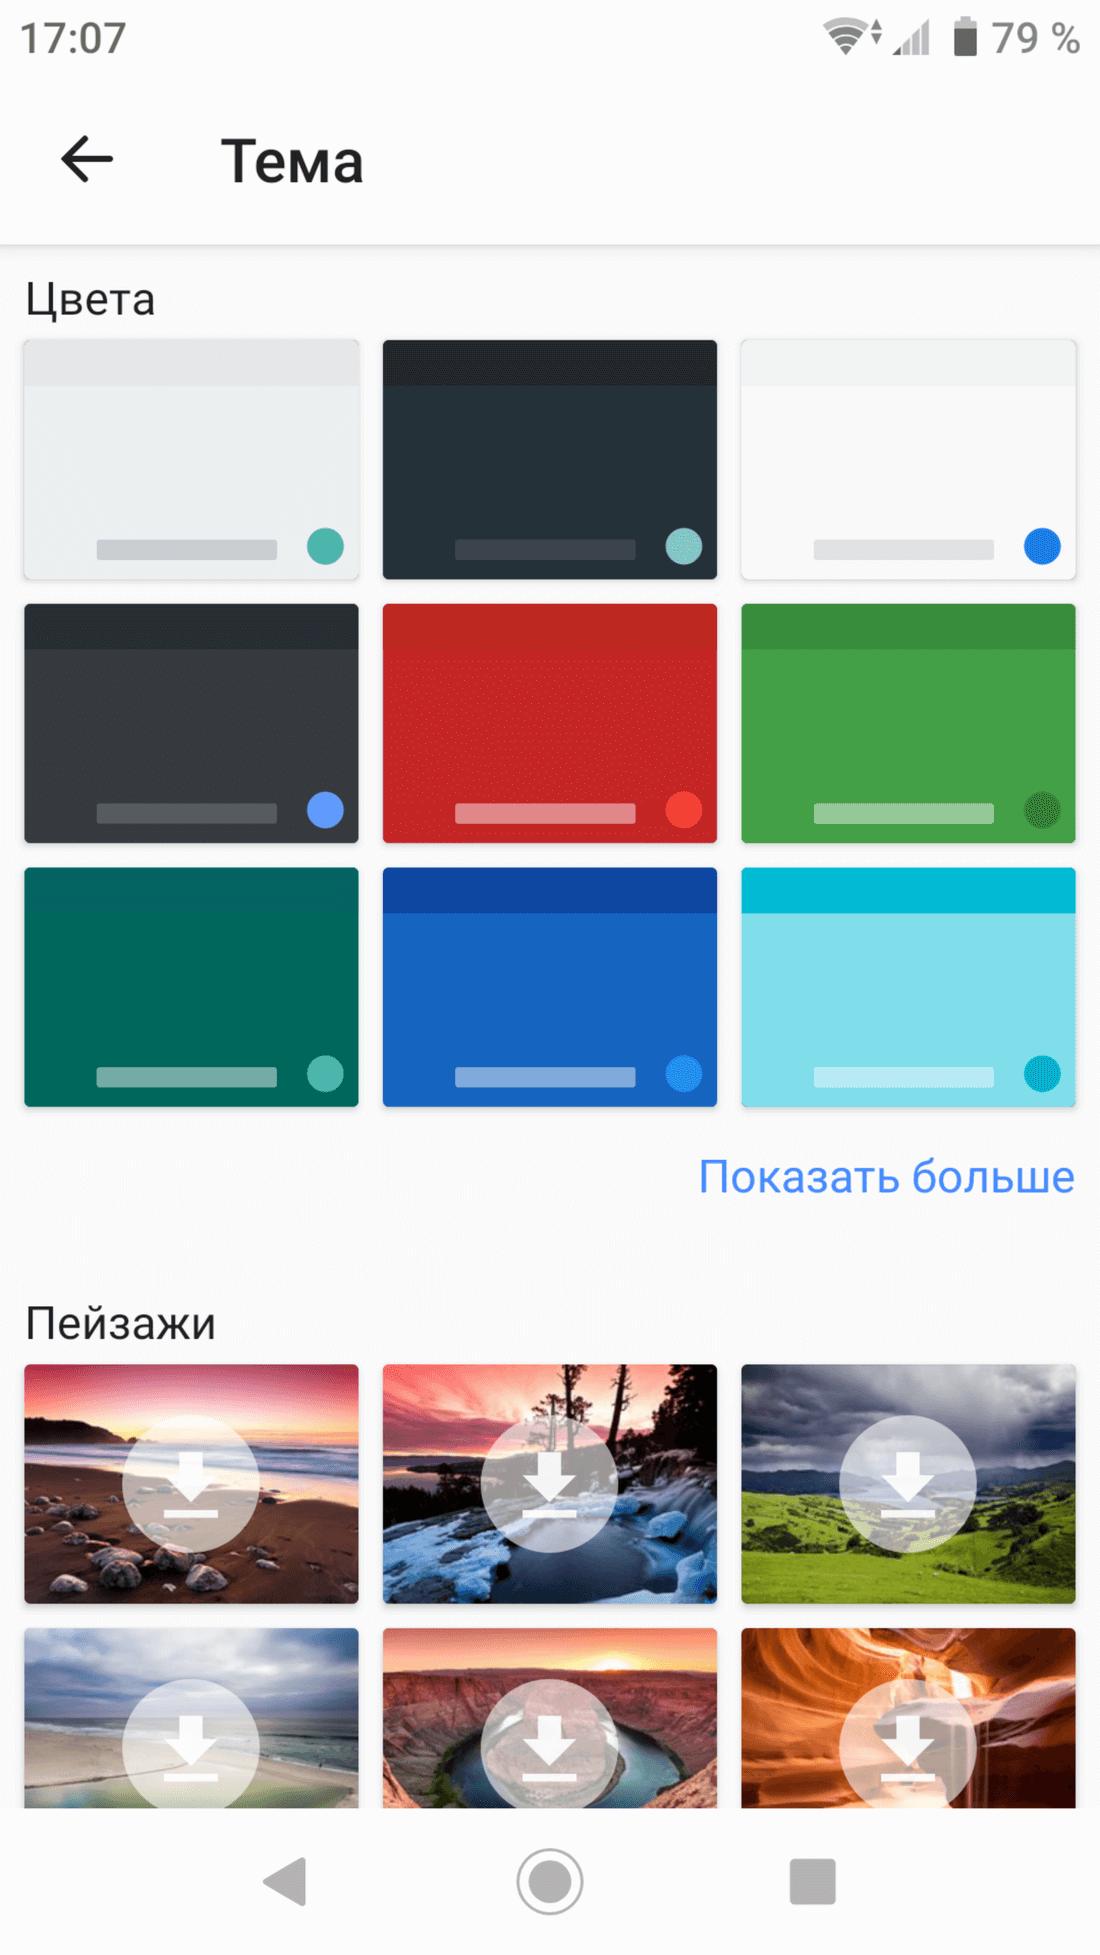 Скриншот #3 из программы Gboard – Клавиатура Гугл